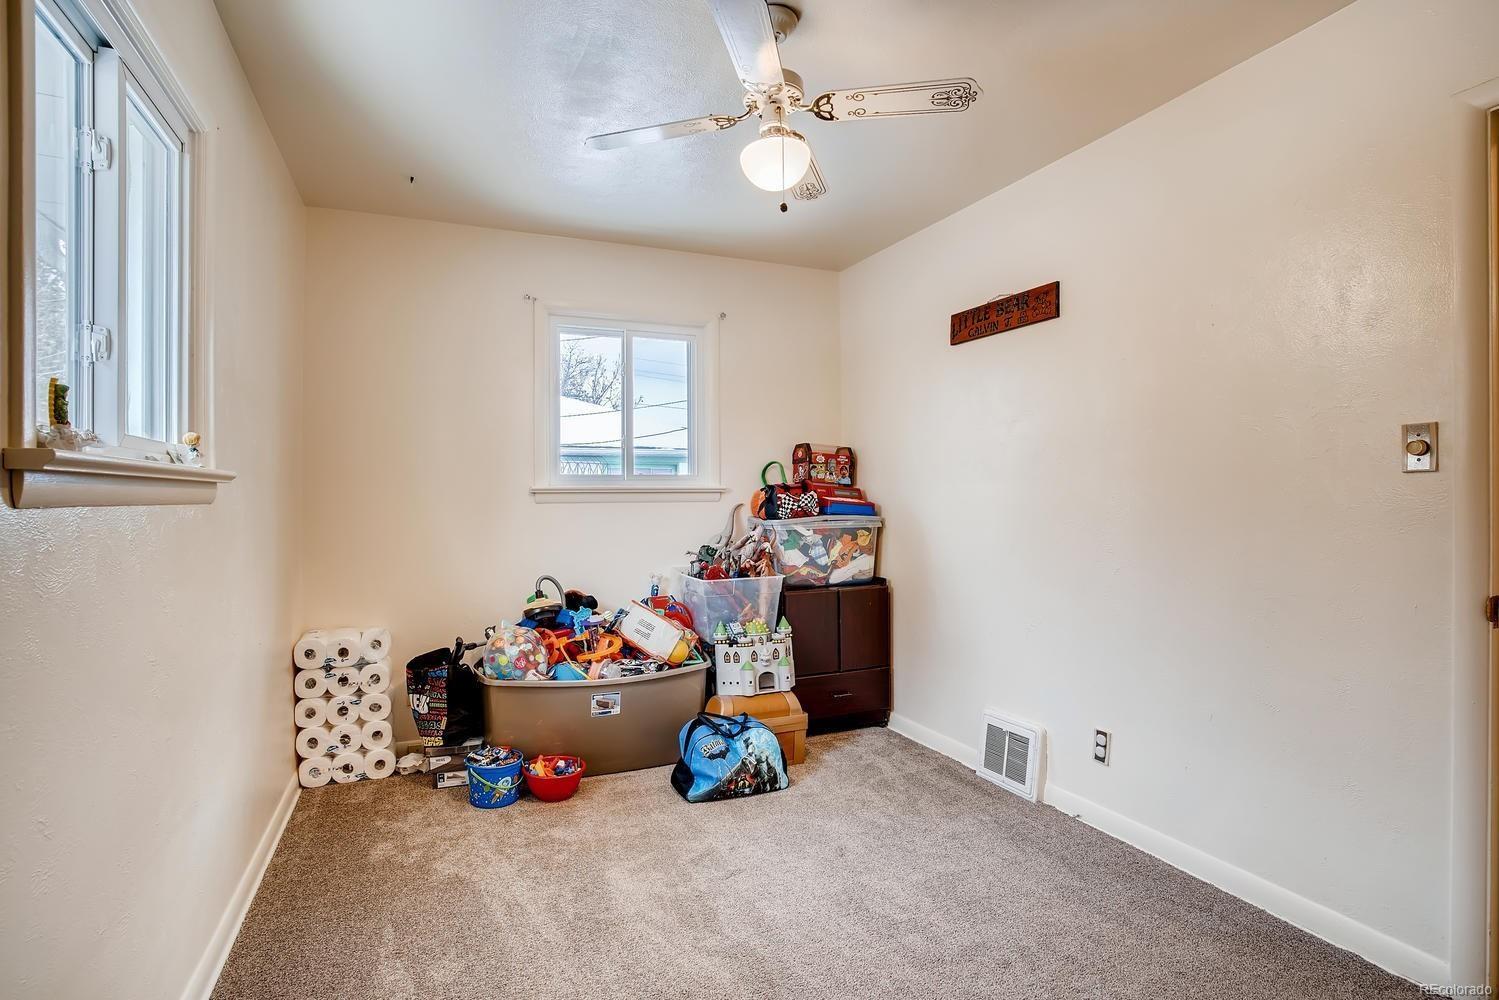 MLS# 2695166 - 18 - 1160 S Wolff Street, Denver, CO 80219